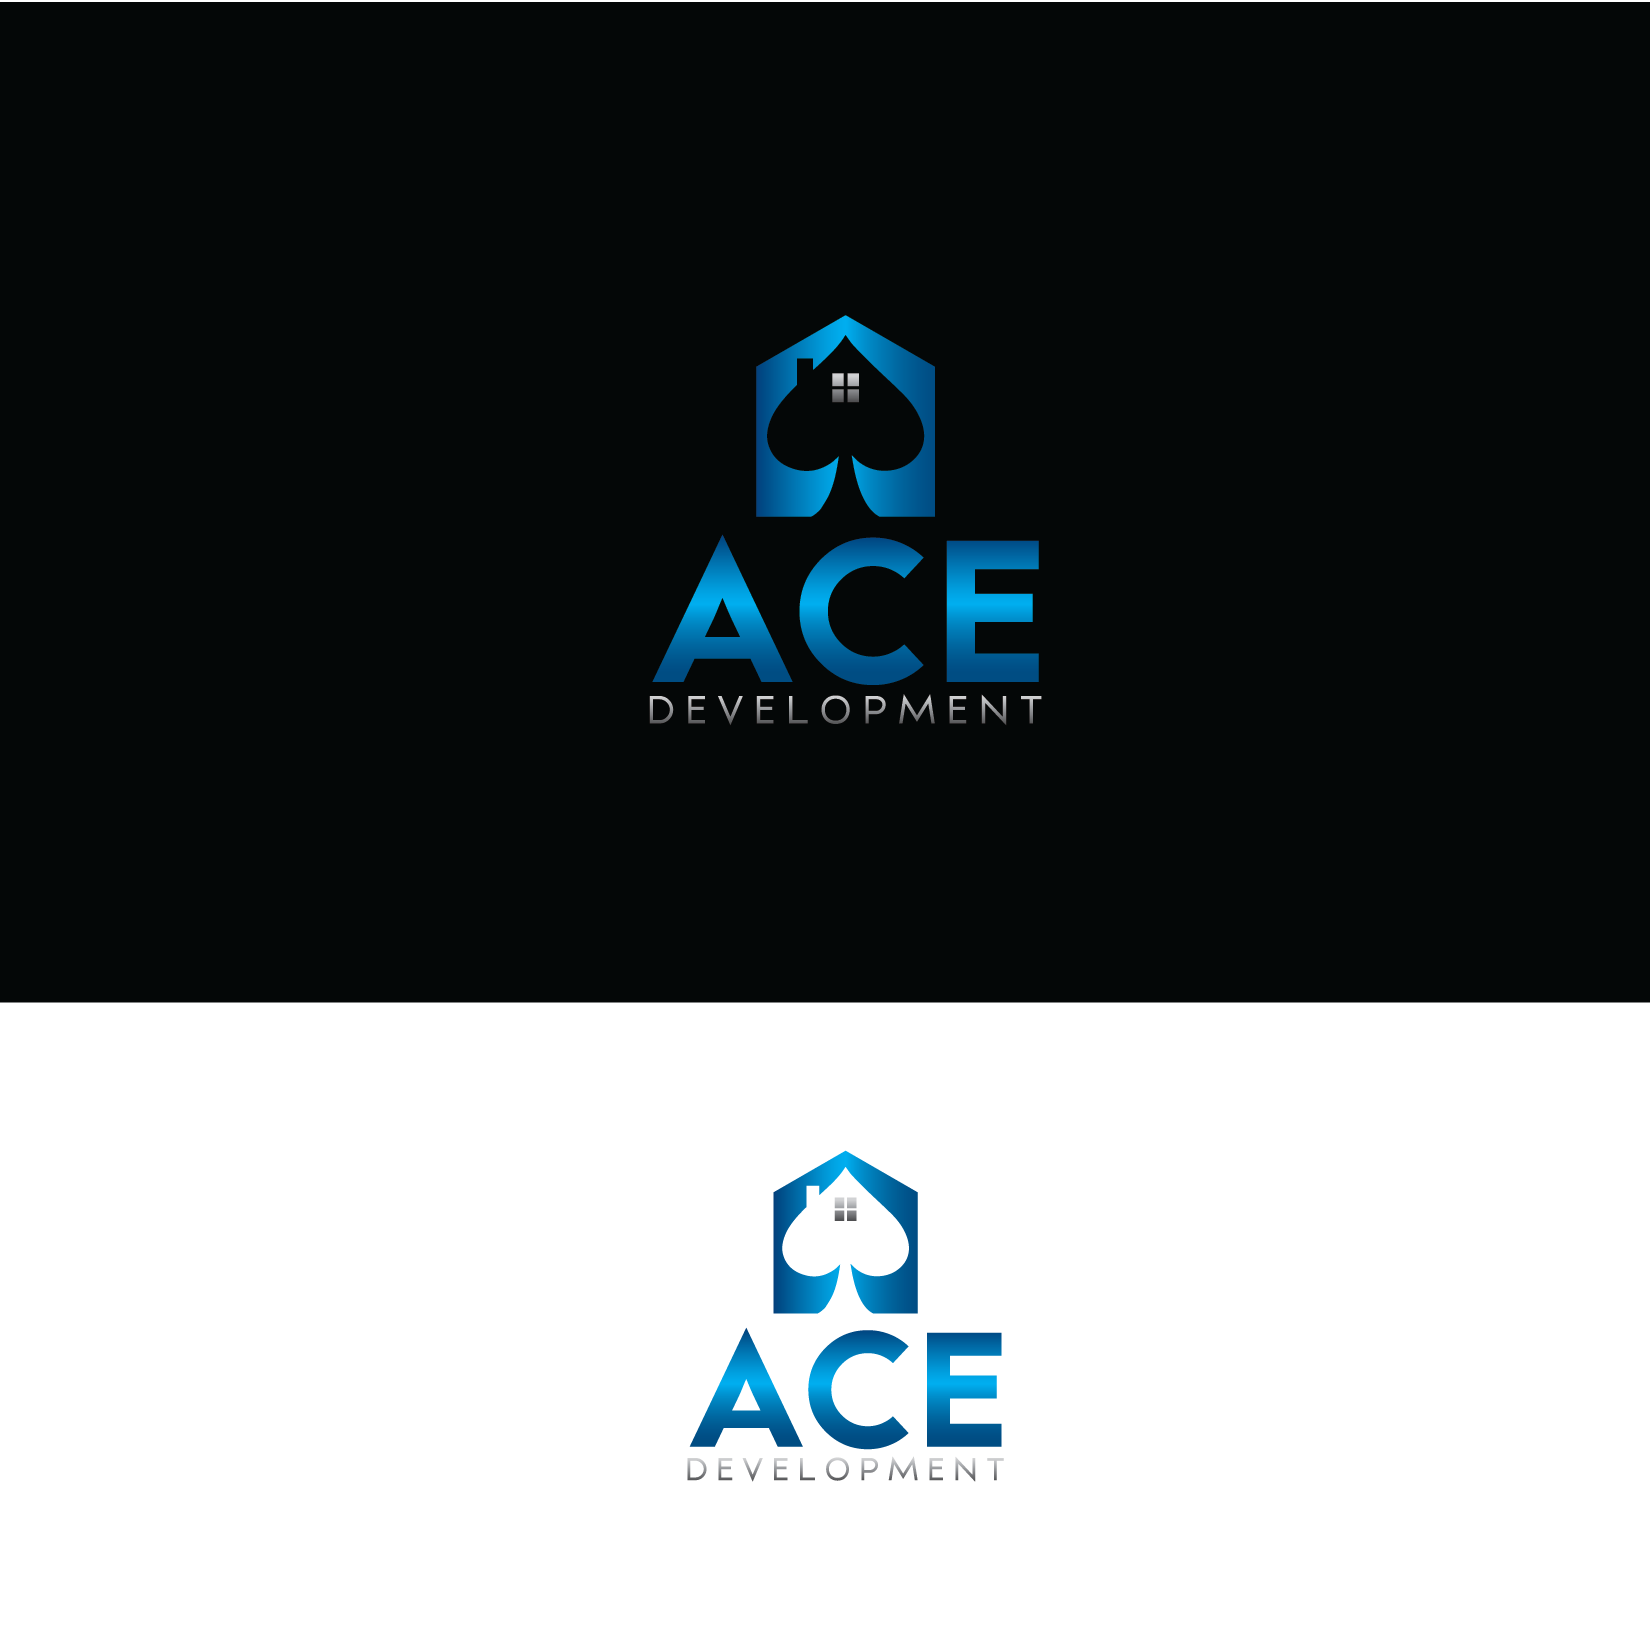 Logo Design by Private User - Entry No. 109 in the Logo Design Contest Fun Logo Design for Ace development.